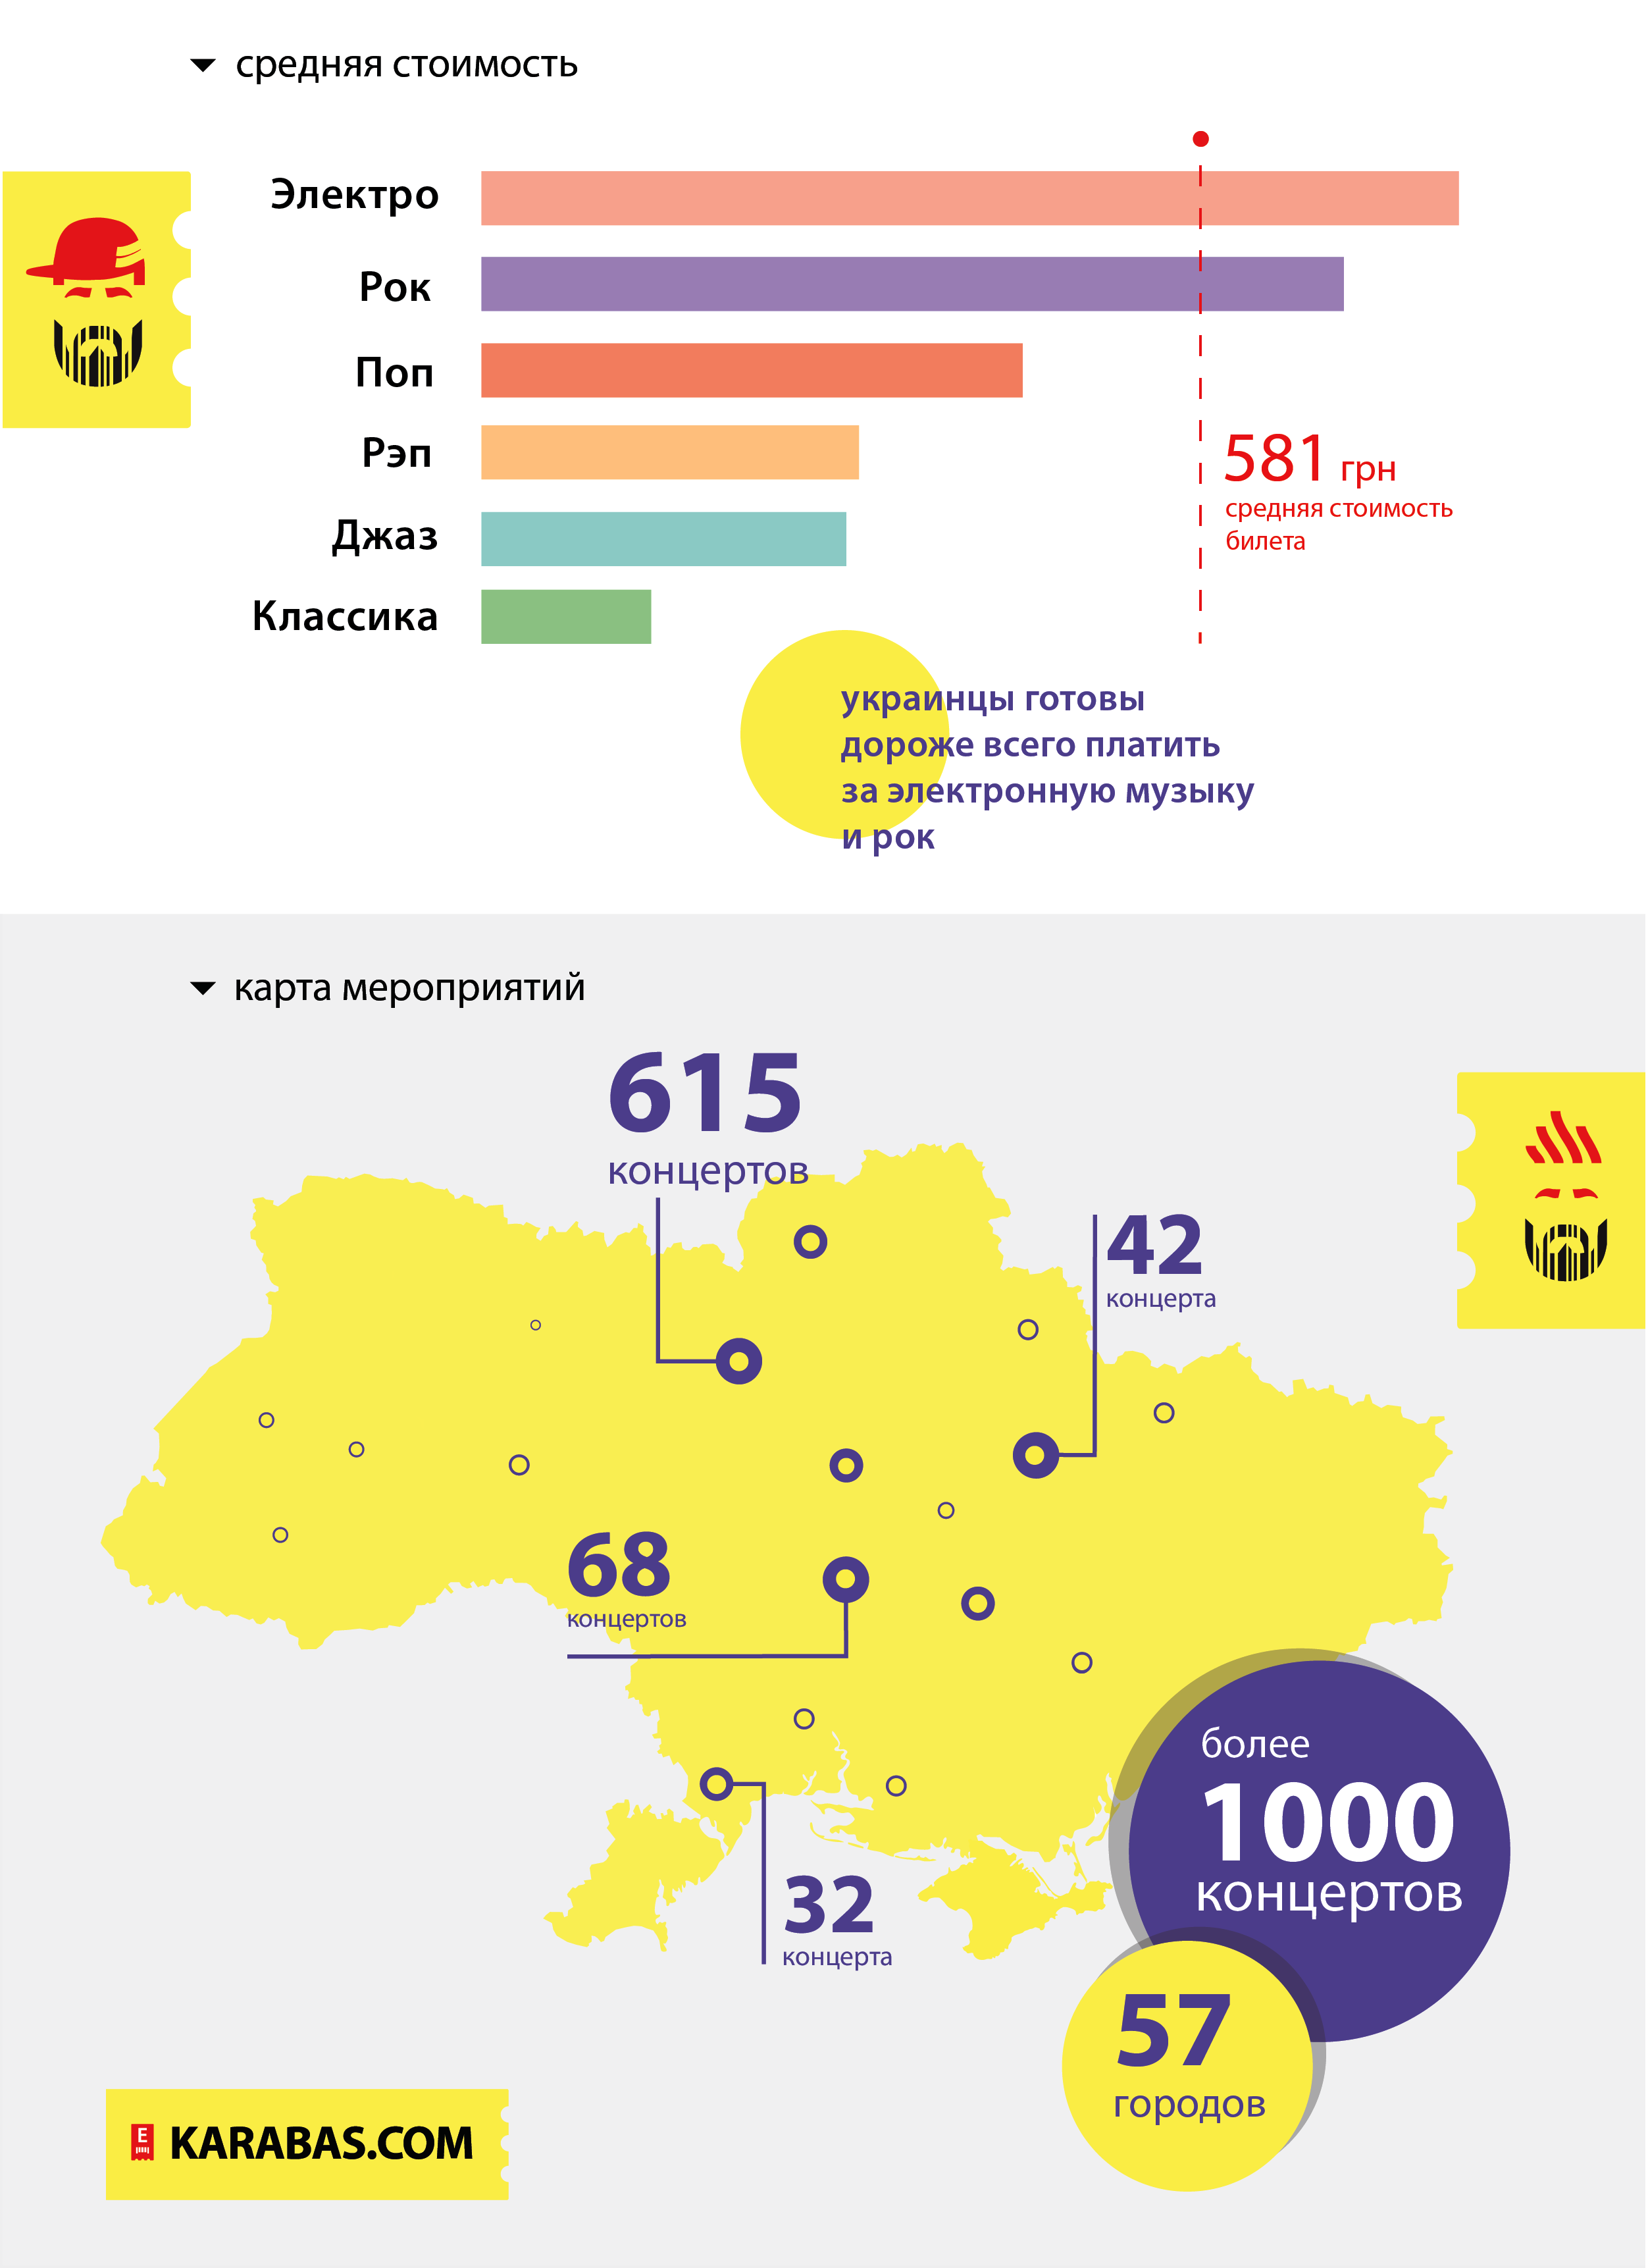 infographic_600_ru_print